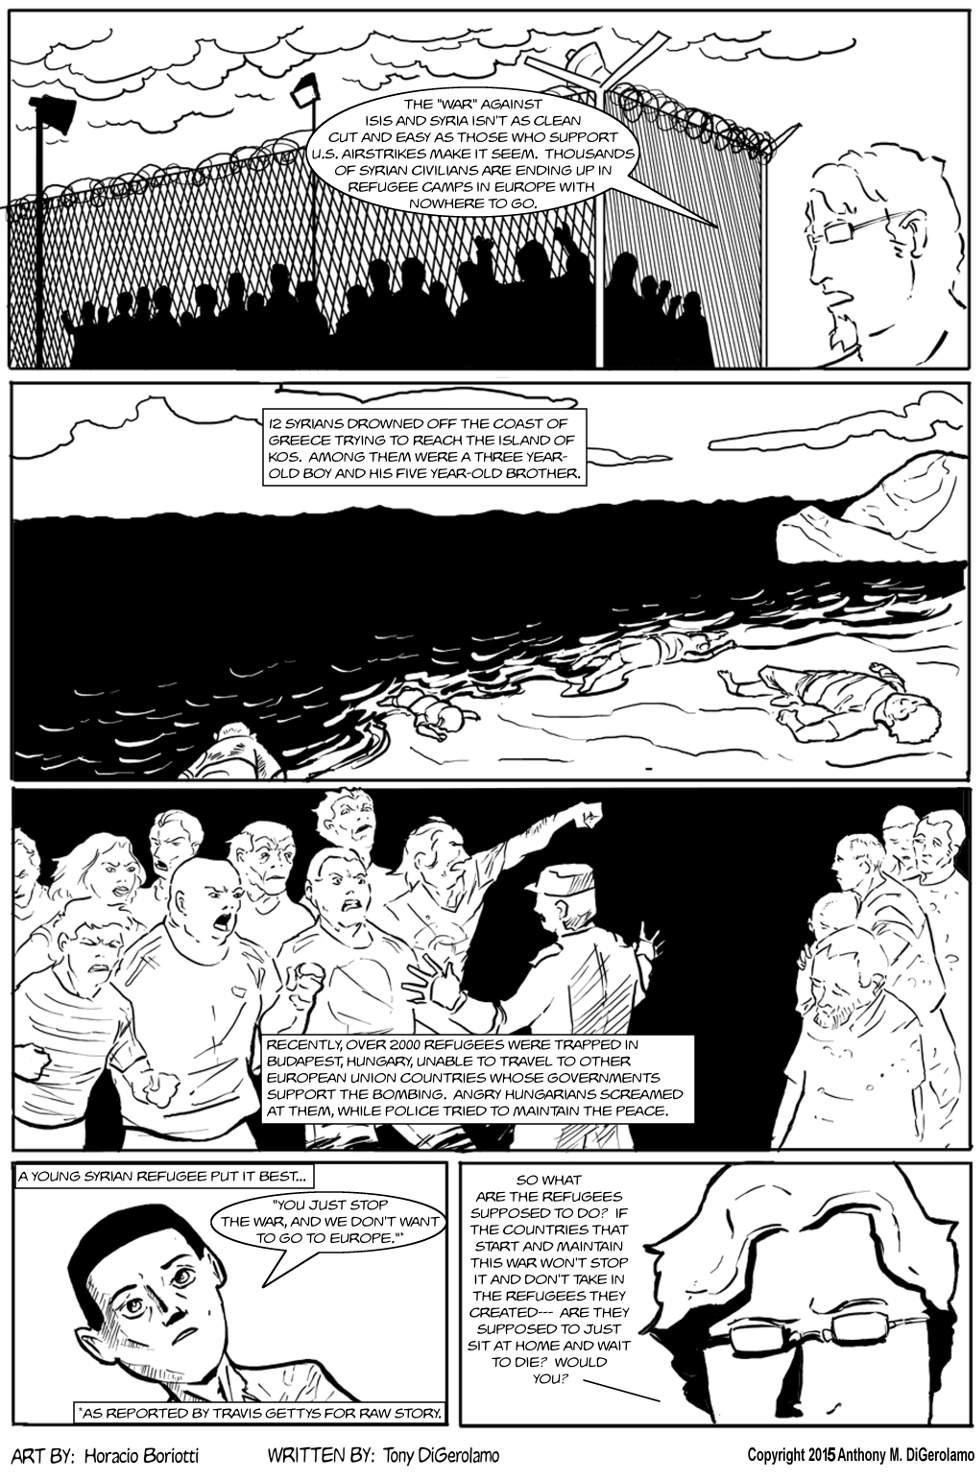 The Antiwar Comic:  Ignoring the Cause